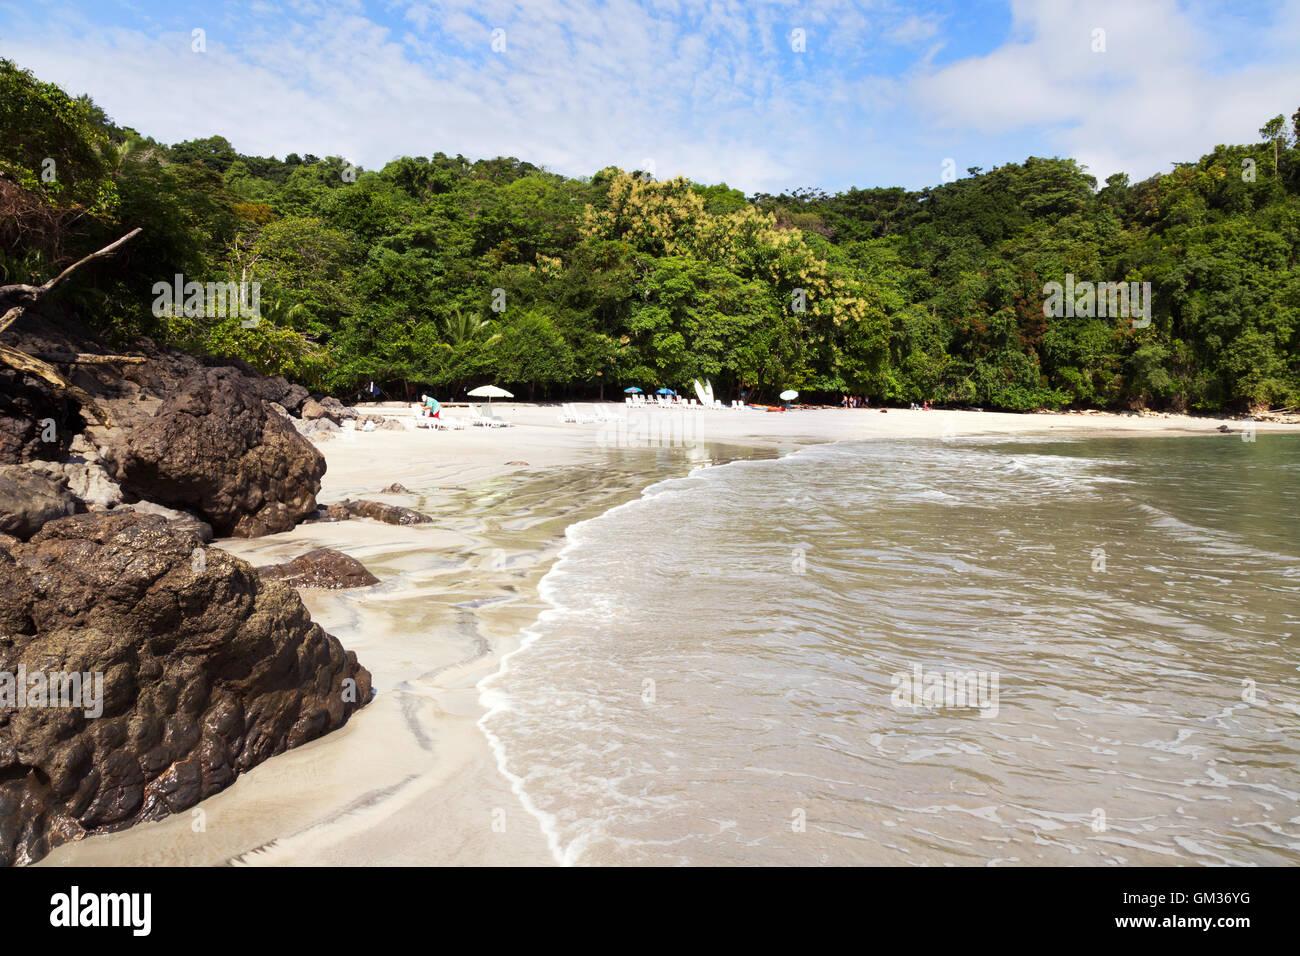 Costa Rica Beach - Playa Biesanz beach, Manuel Antonio national park, Pacific coast, Costa Rica, Central America - Stock Image